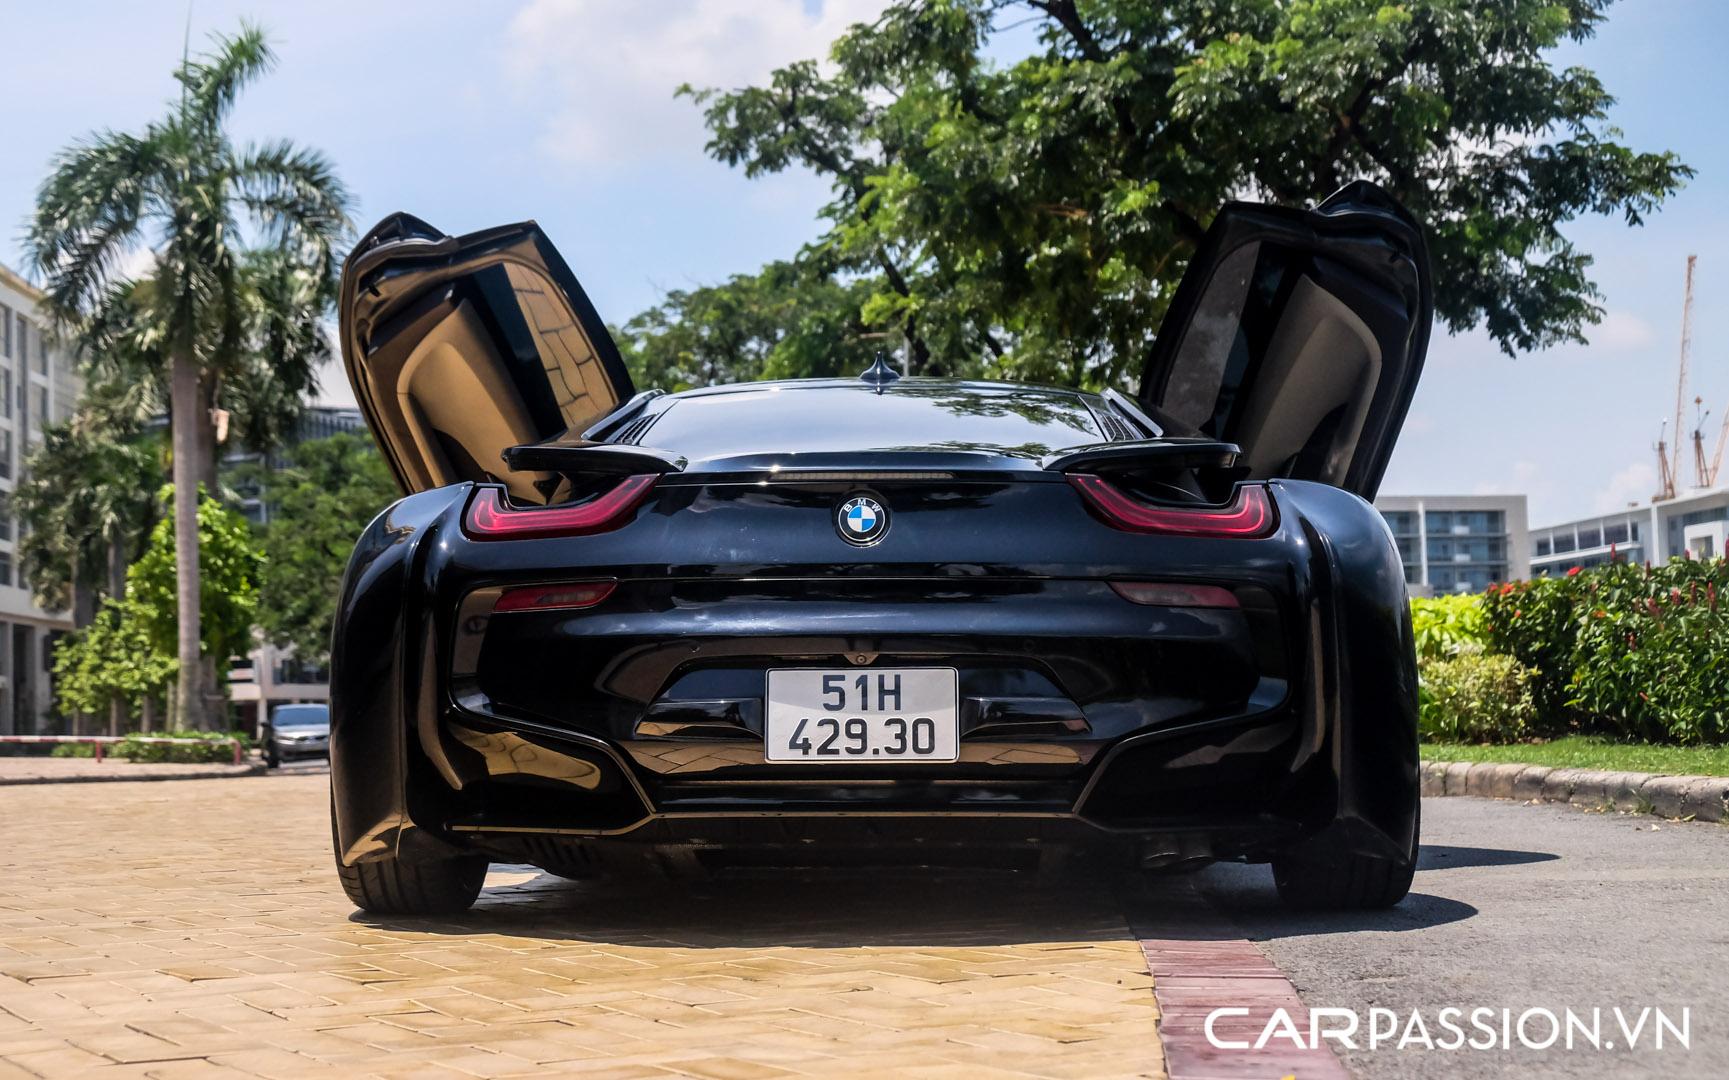 CP-BMW i8 widebody (23).jpg